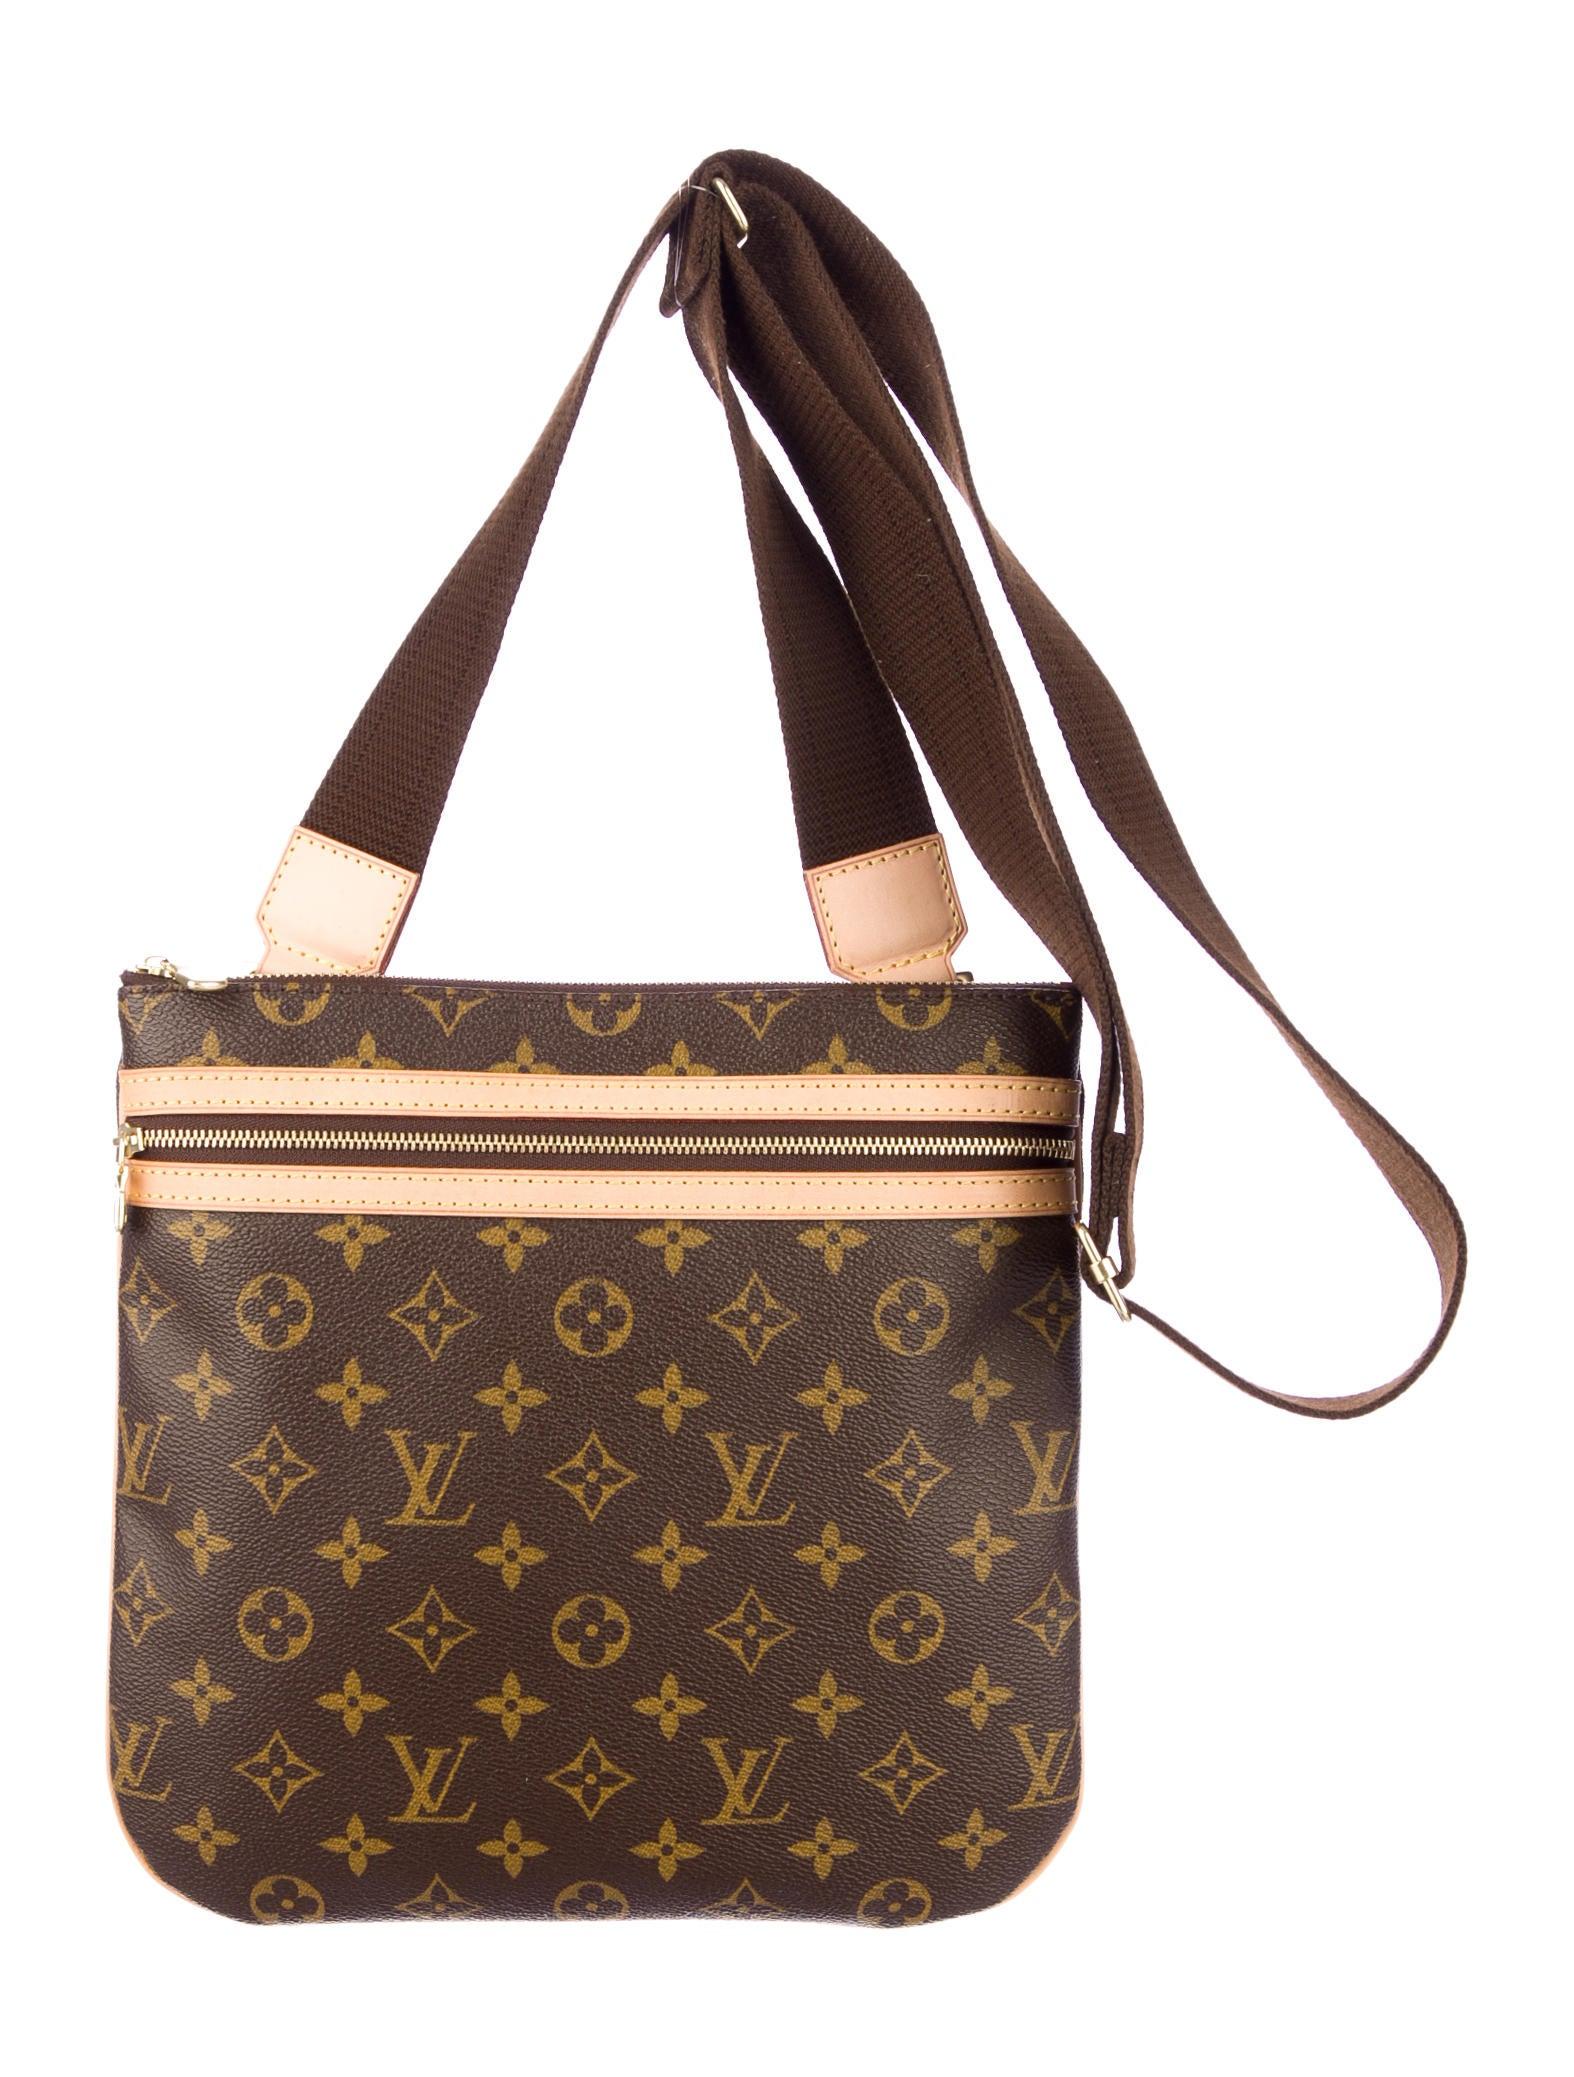 Louis Vuitton Pochette Bosphore Crossbody - Bags - LOU34360  4f03cfeff5dff